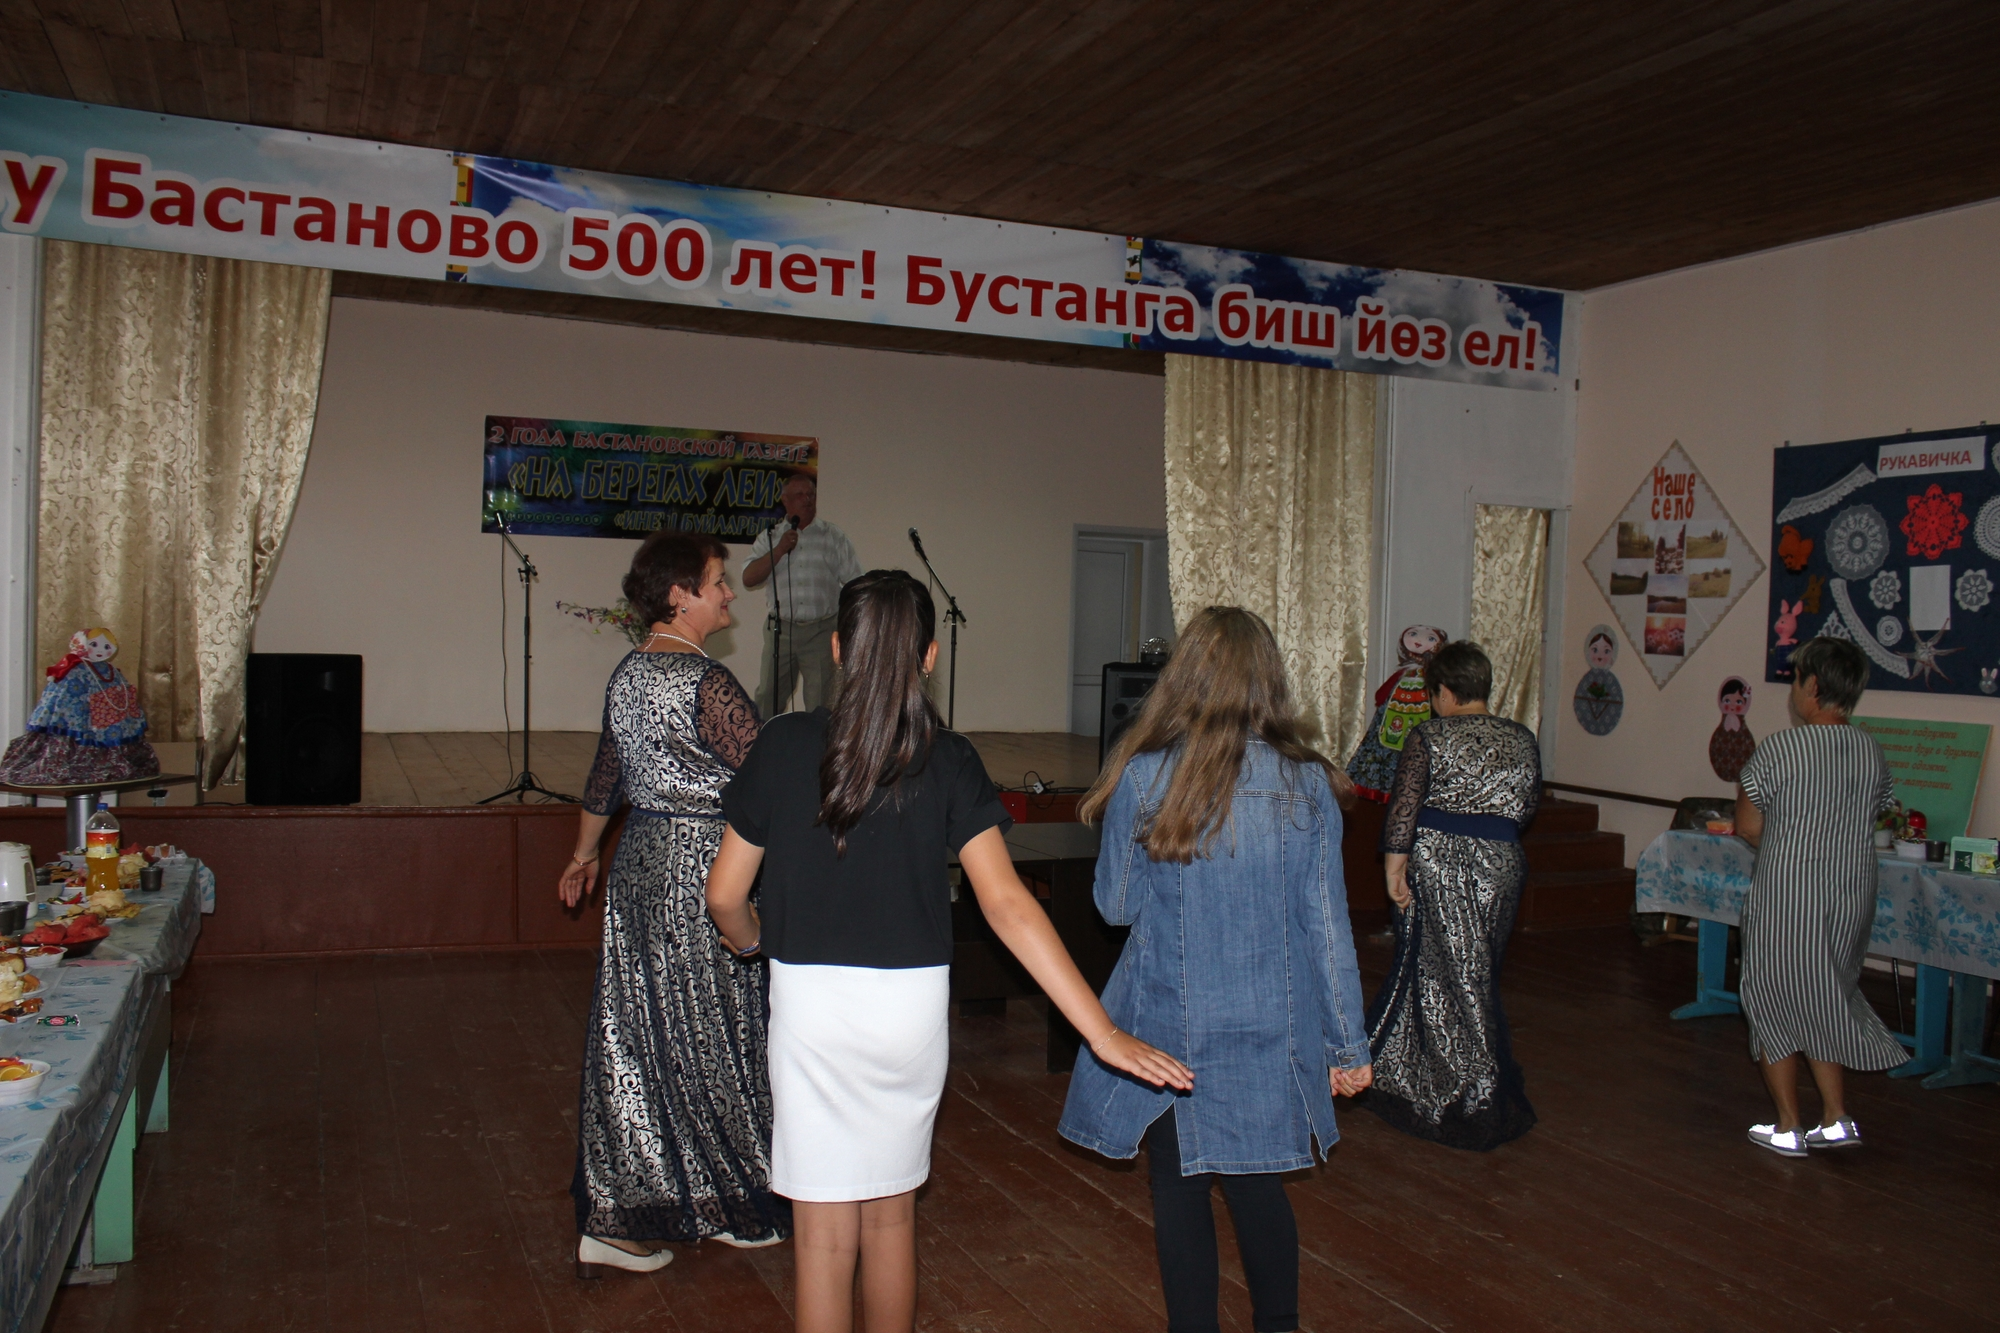 6933-bastanovo-17082019-gazete-na-beregax-leyi-2-goda